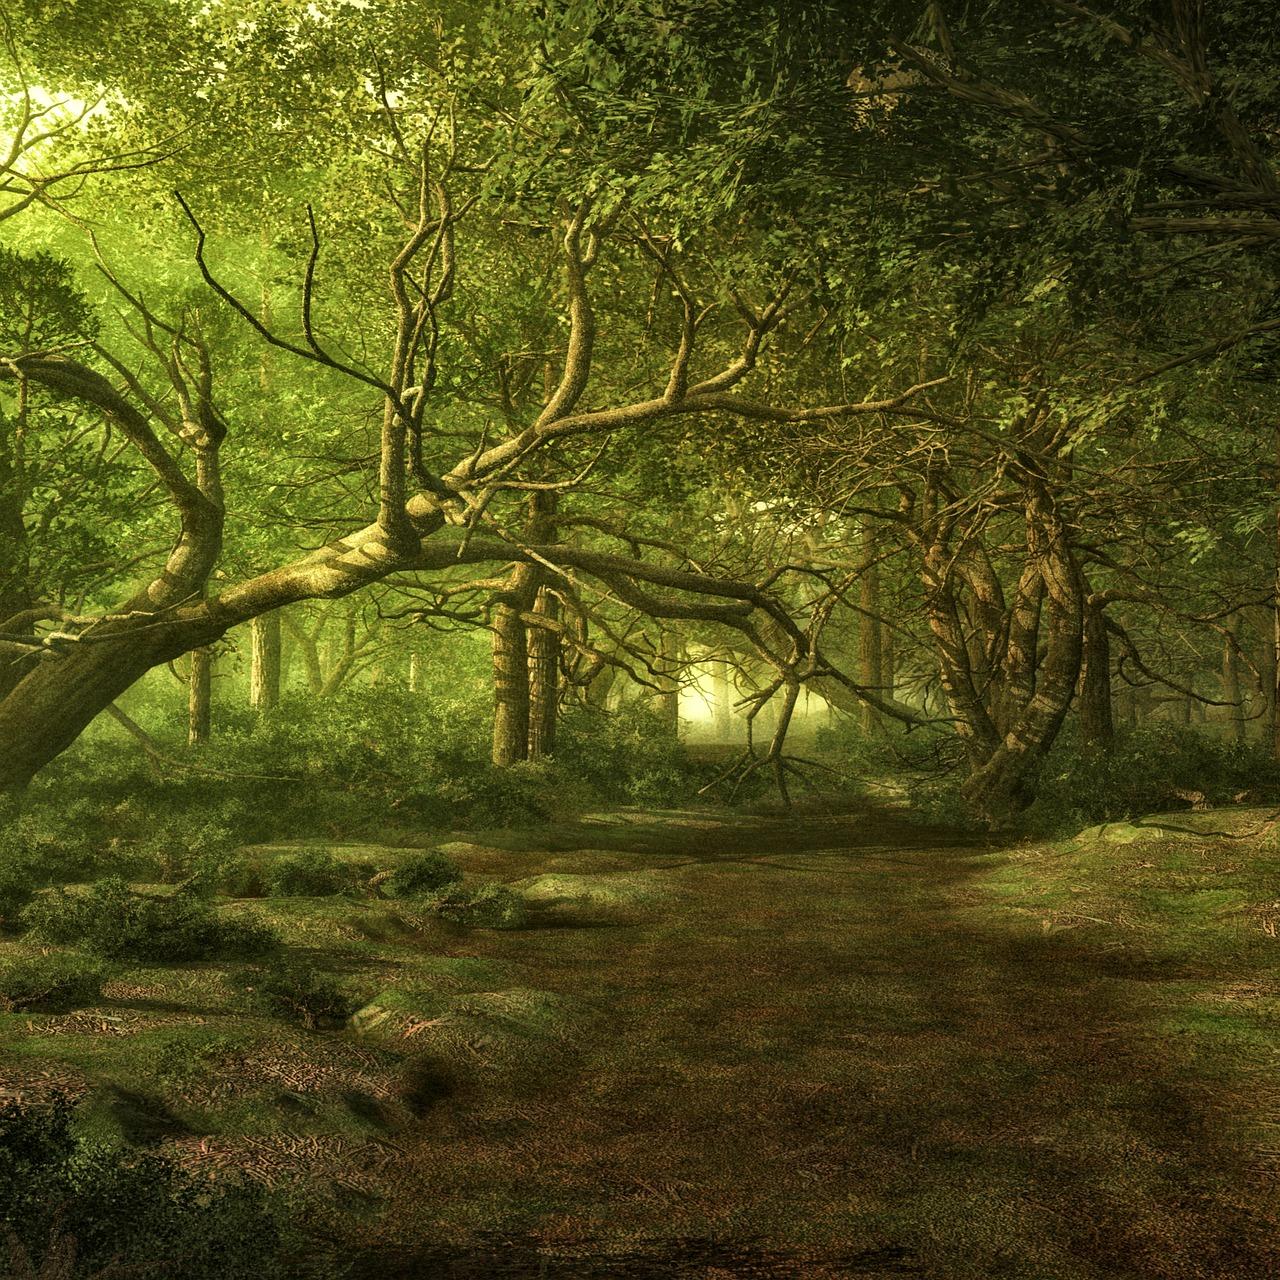 forest-1699079_1280.jpg